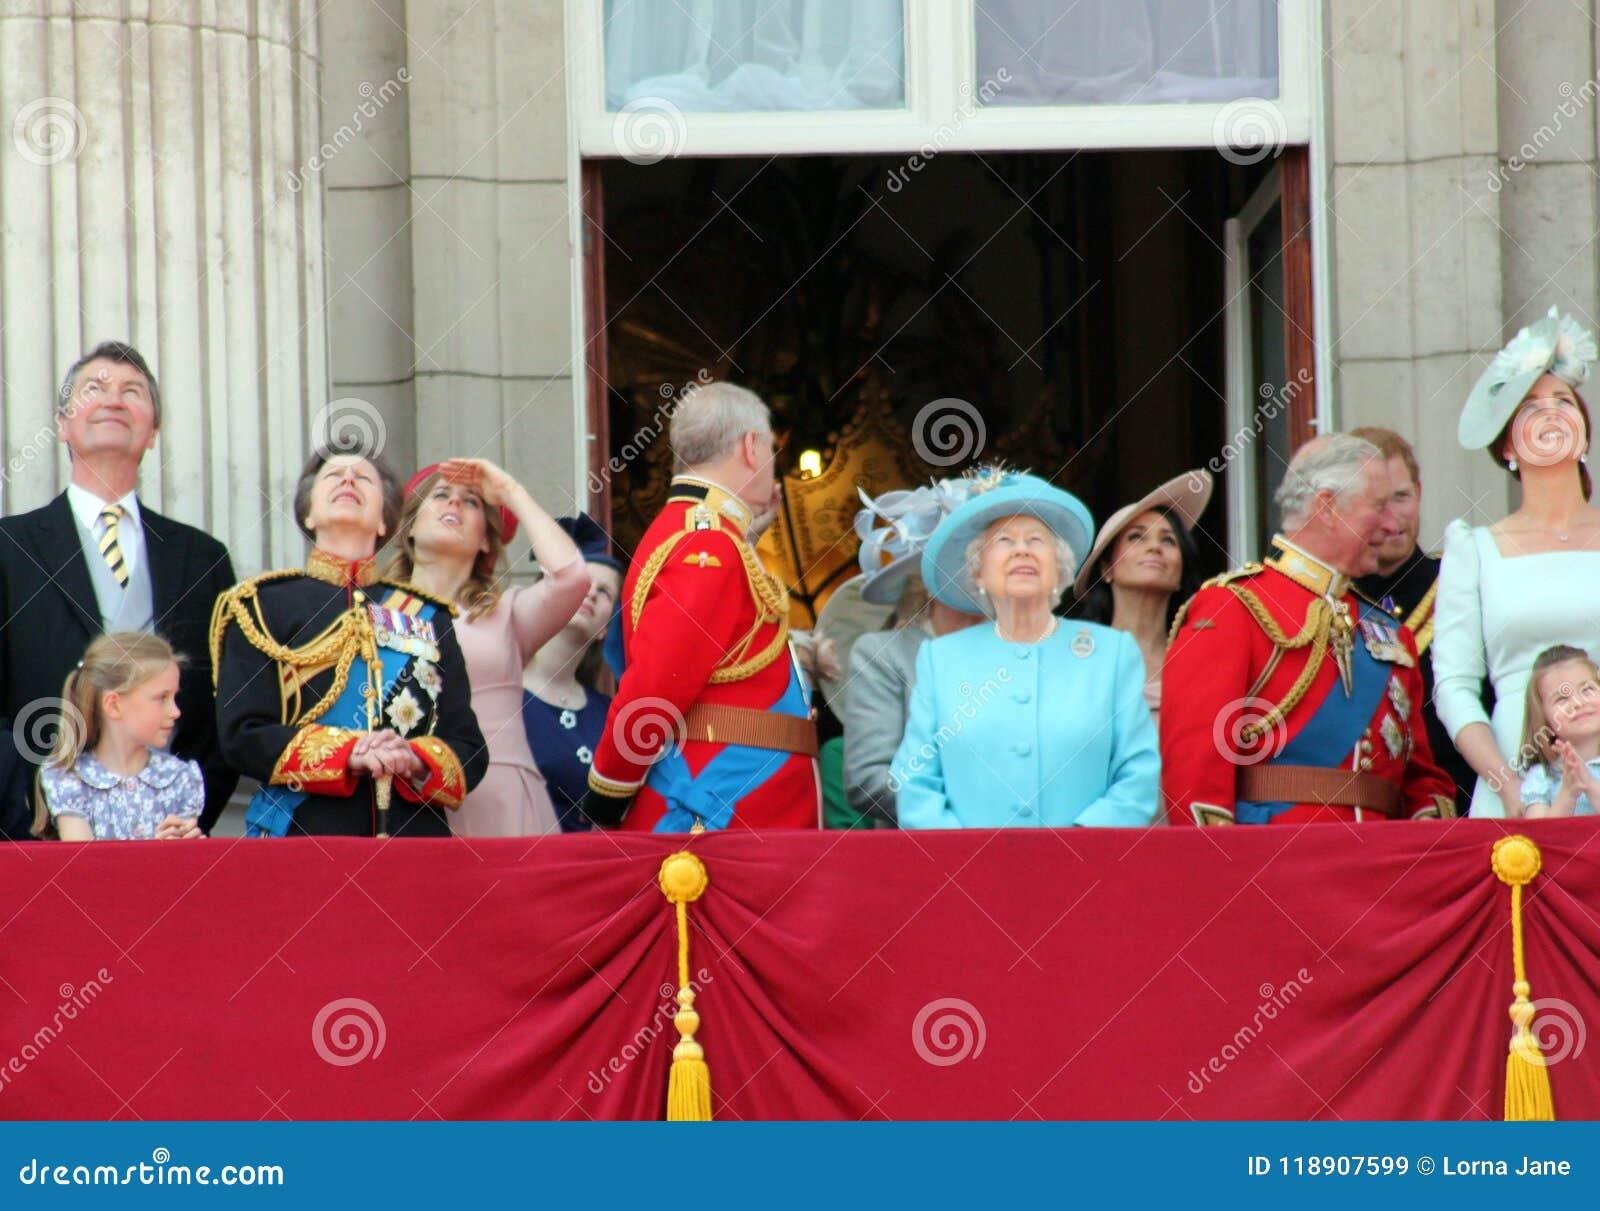 Königin Elizabeth, London, Großbritannien, am 9. Juni 2018 - Meghan Markle, Prinz Harry, Prinz George William, Charles, Kate Midd